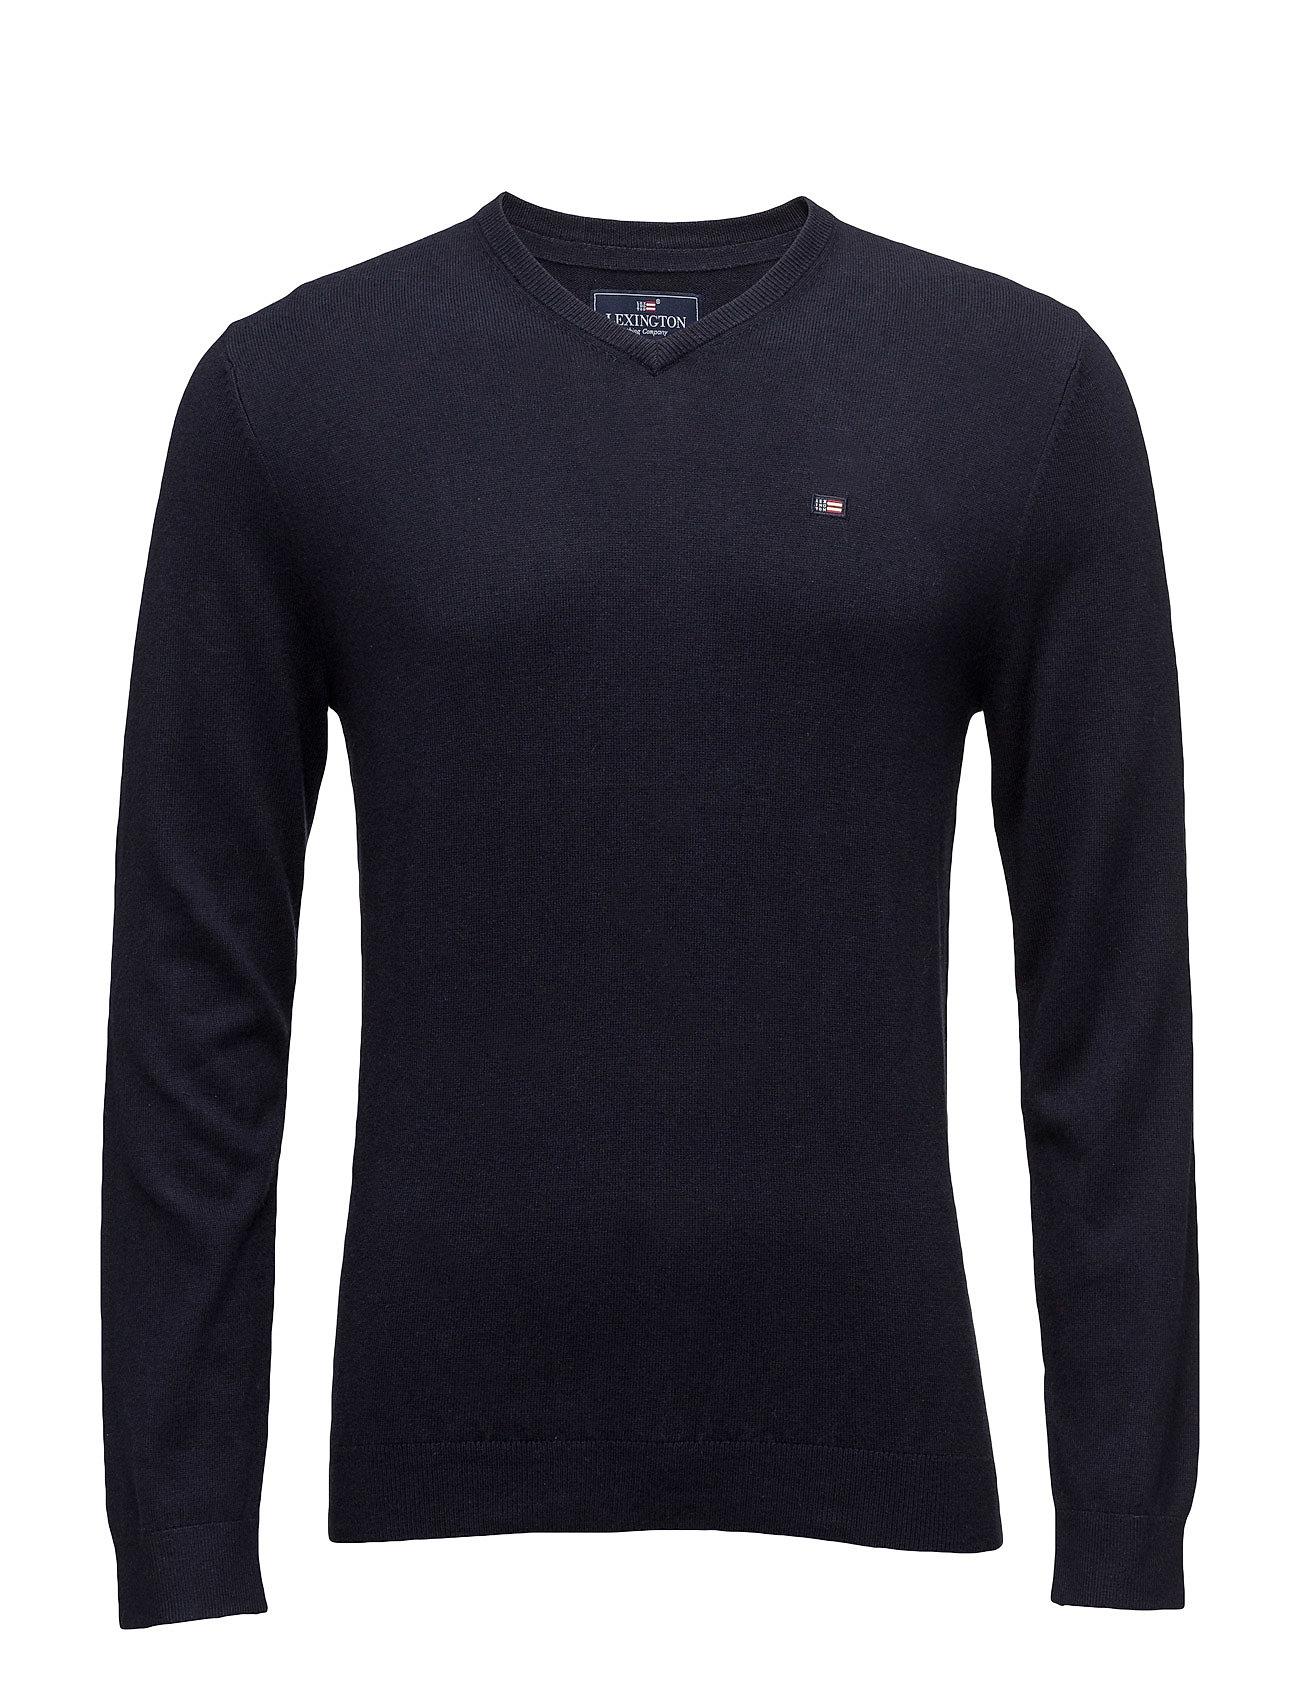 Lexington Clothing Nicholas V-Neck Sweater